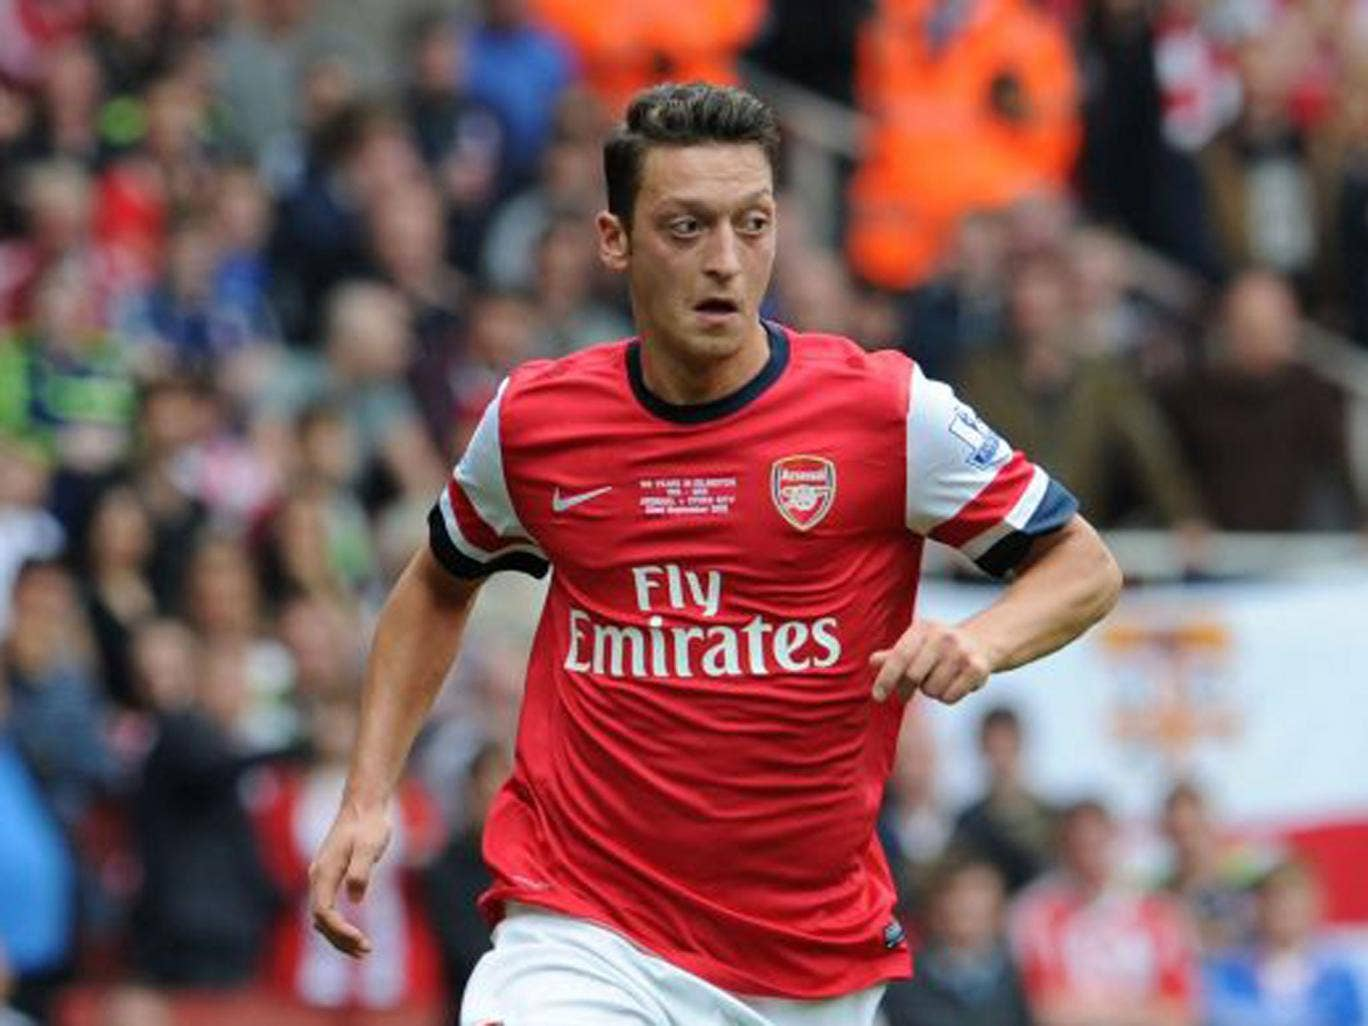 Mesut Ozil cost a club record fee of £42.5m